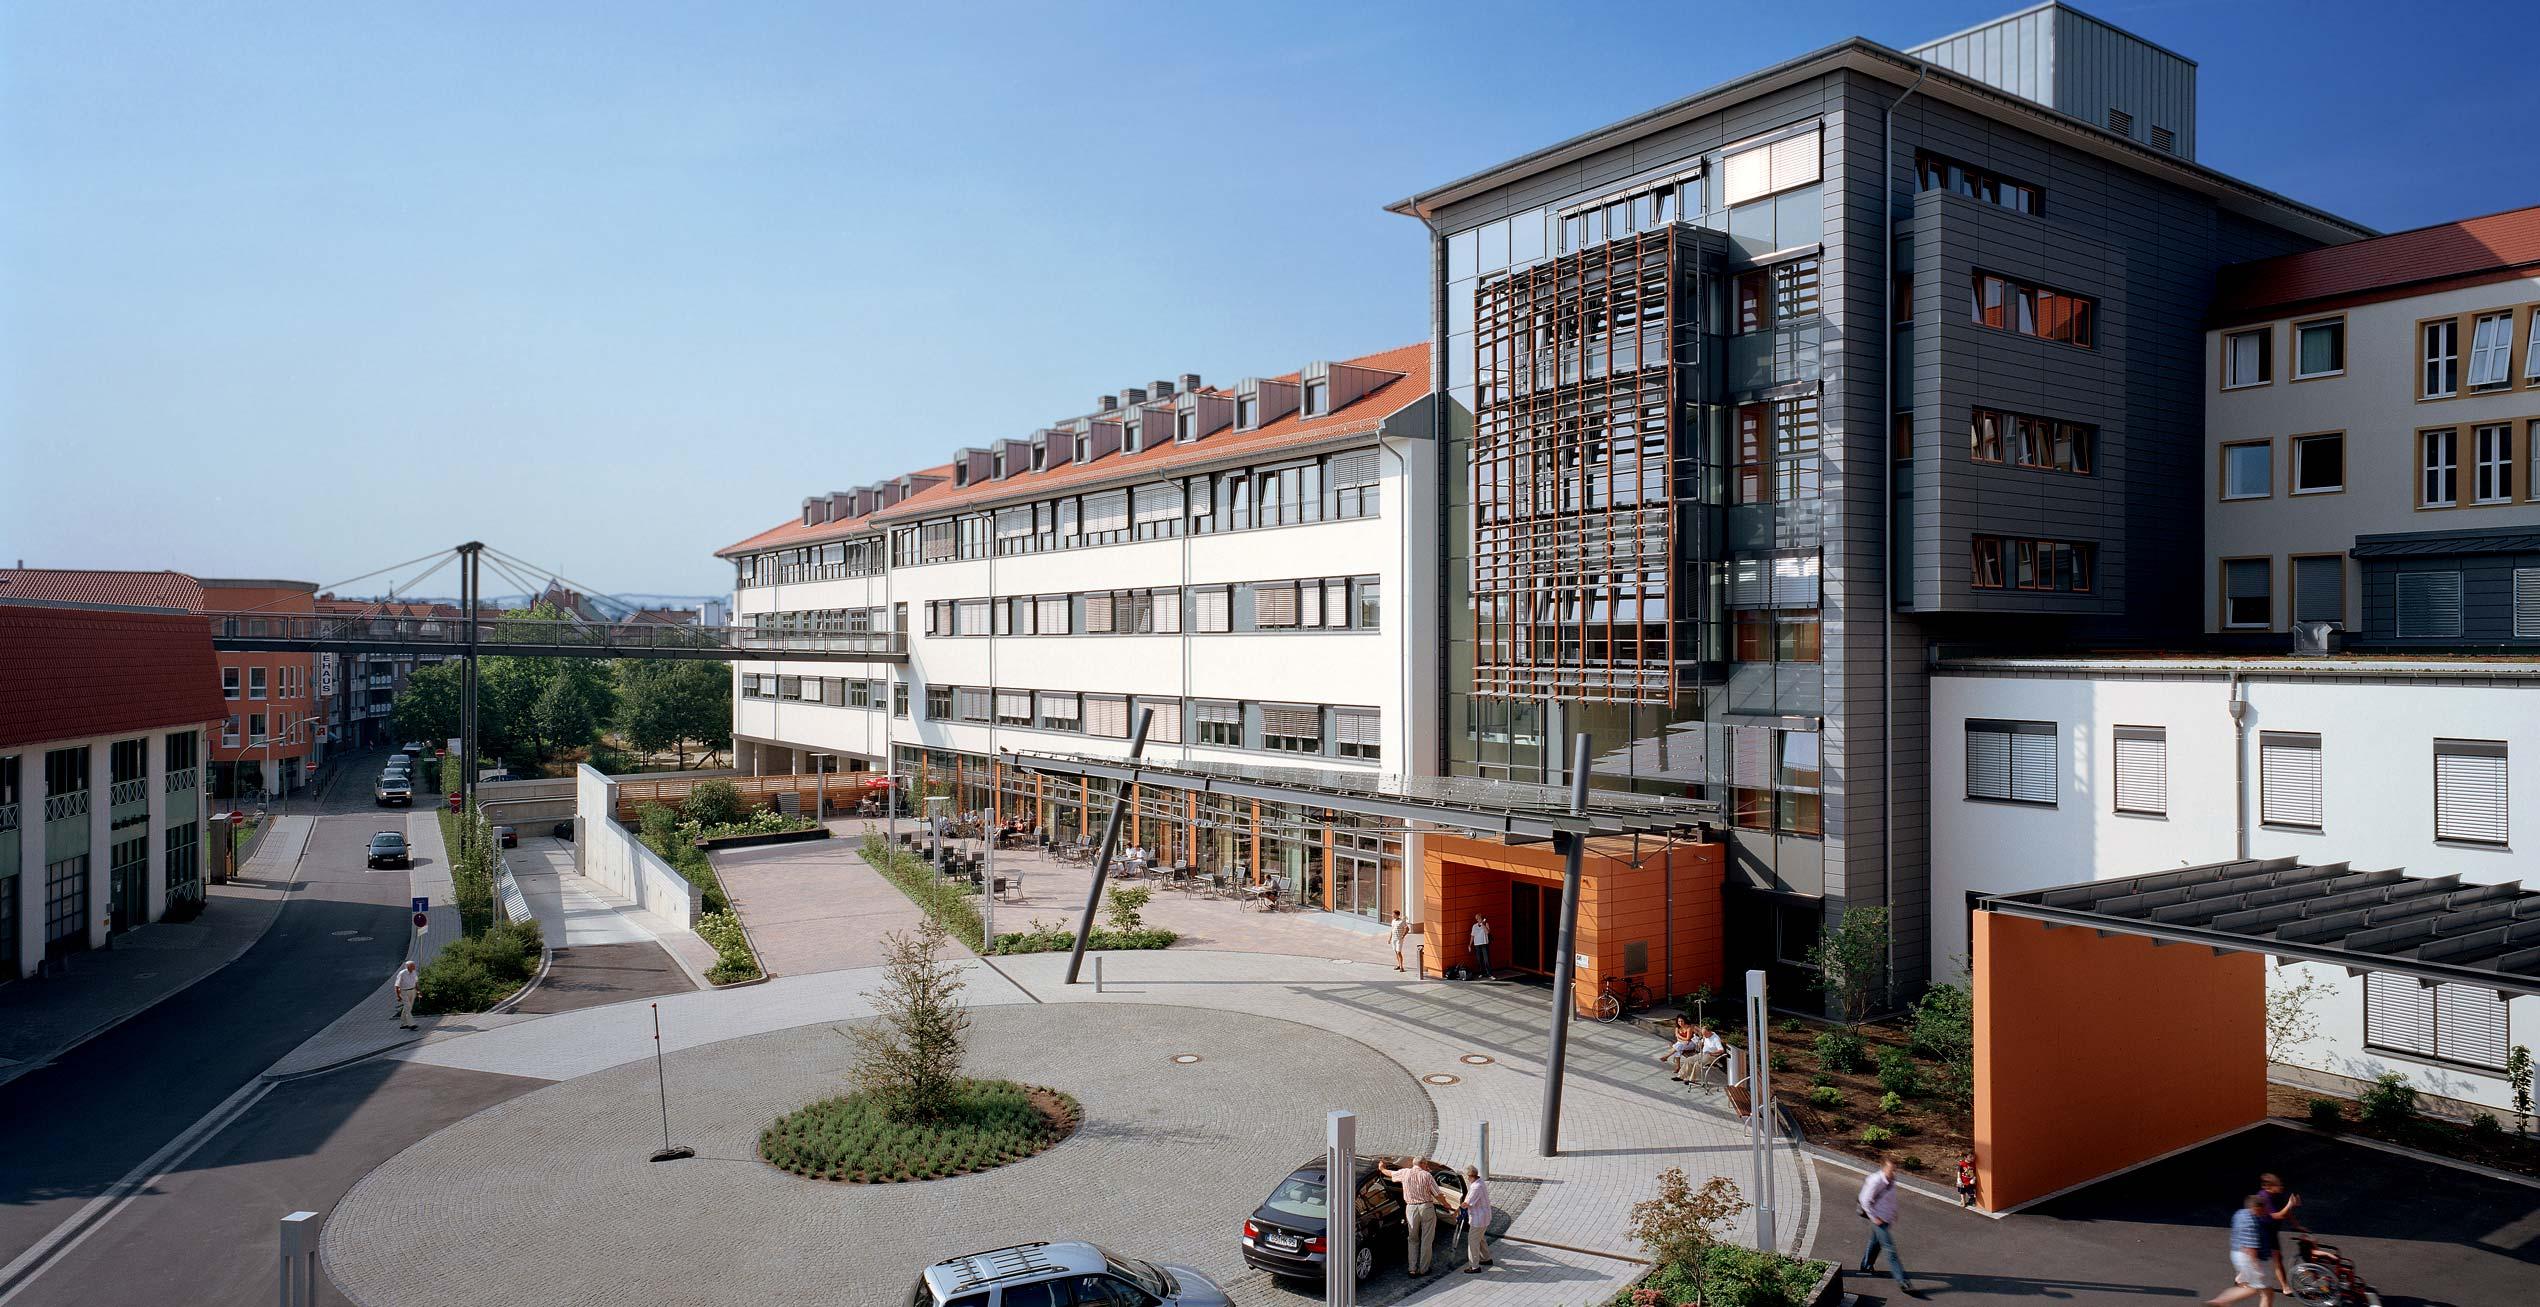 Bild des Funktionstraktes Marienhospital Osnabrück